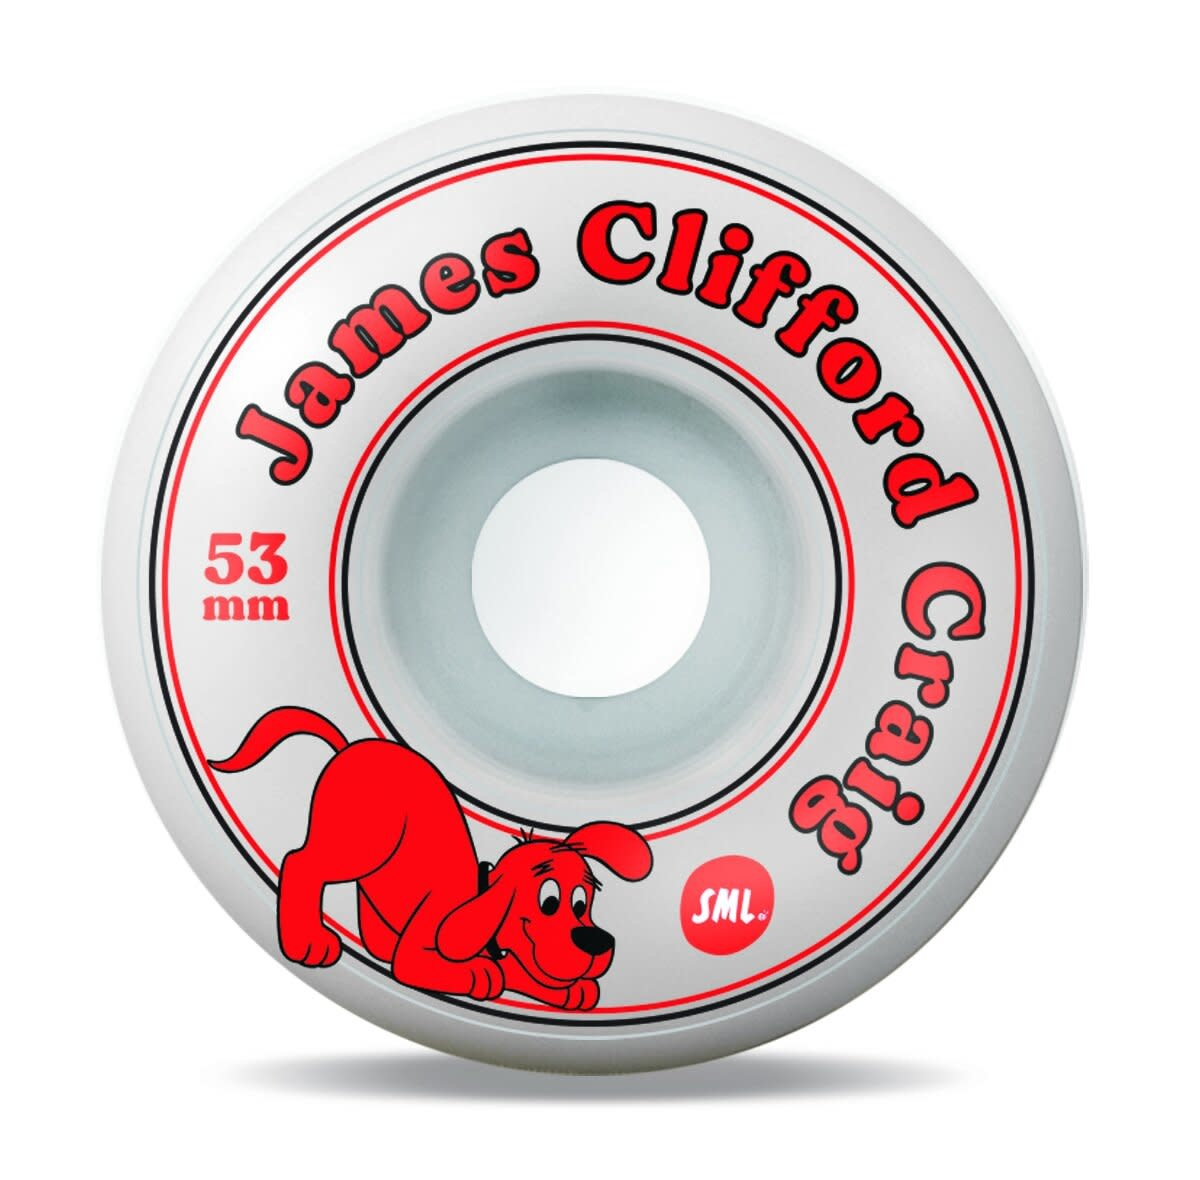 SML. Wheels Classic James Craig OG Wide 99a 53